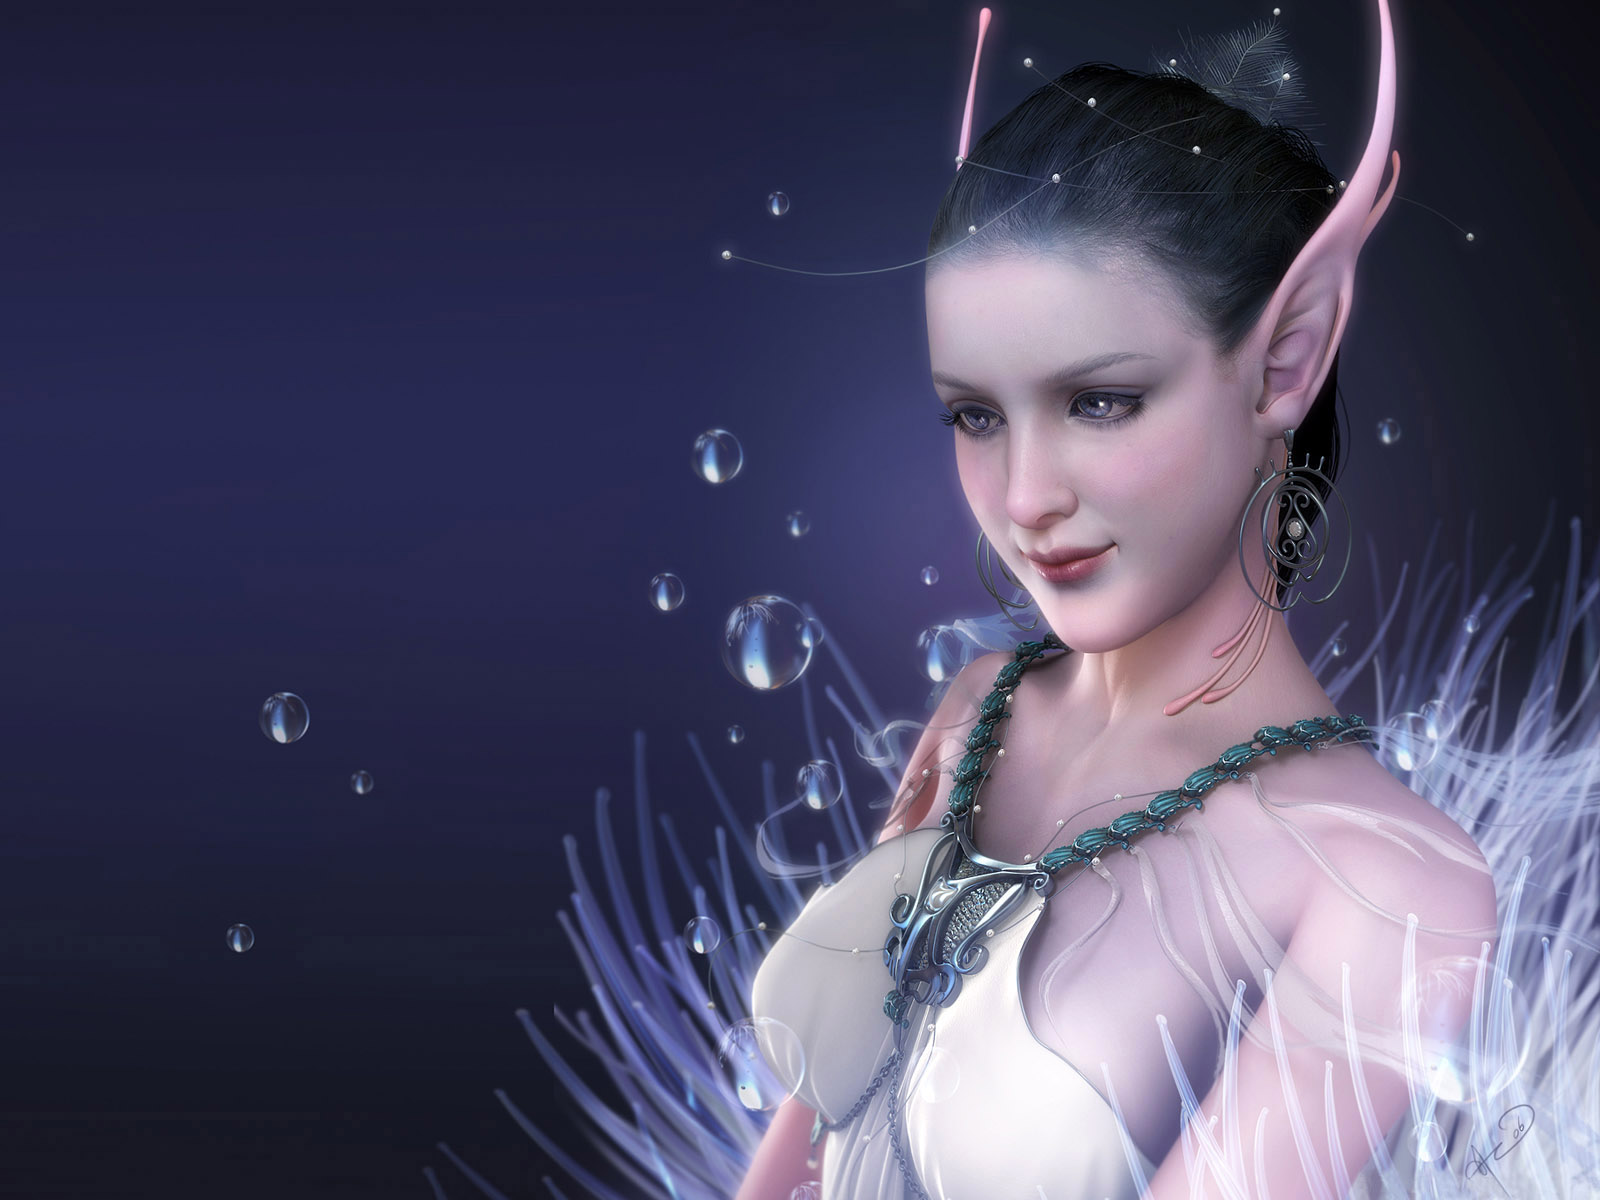 Free fantasy women wallpaper